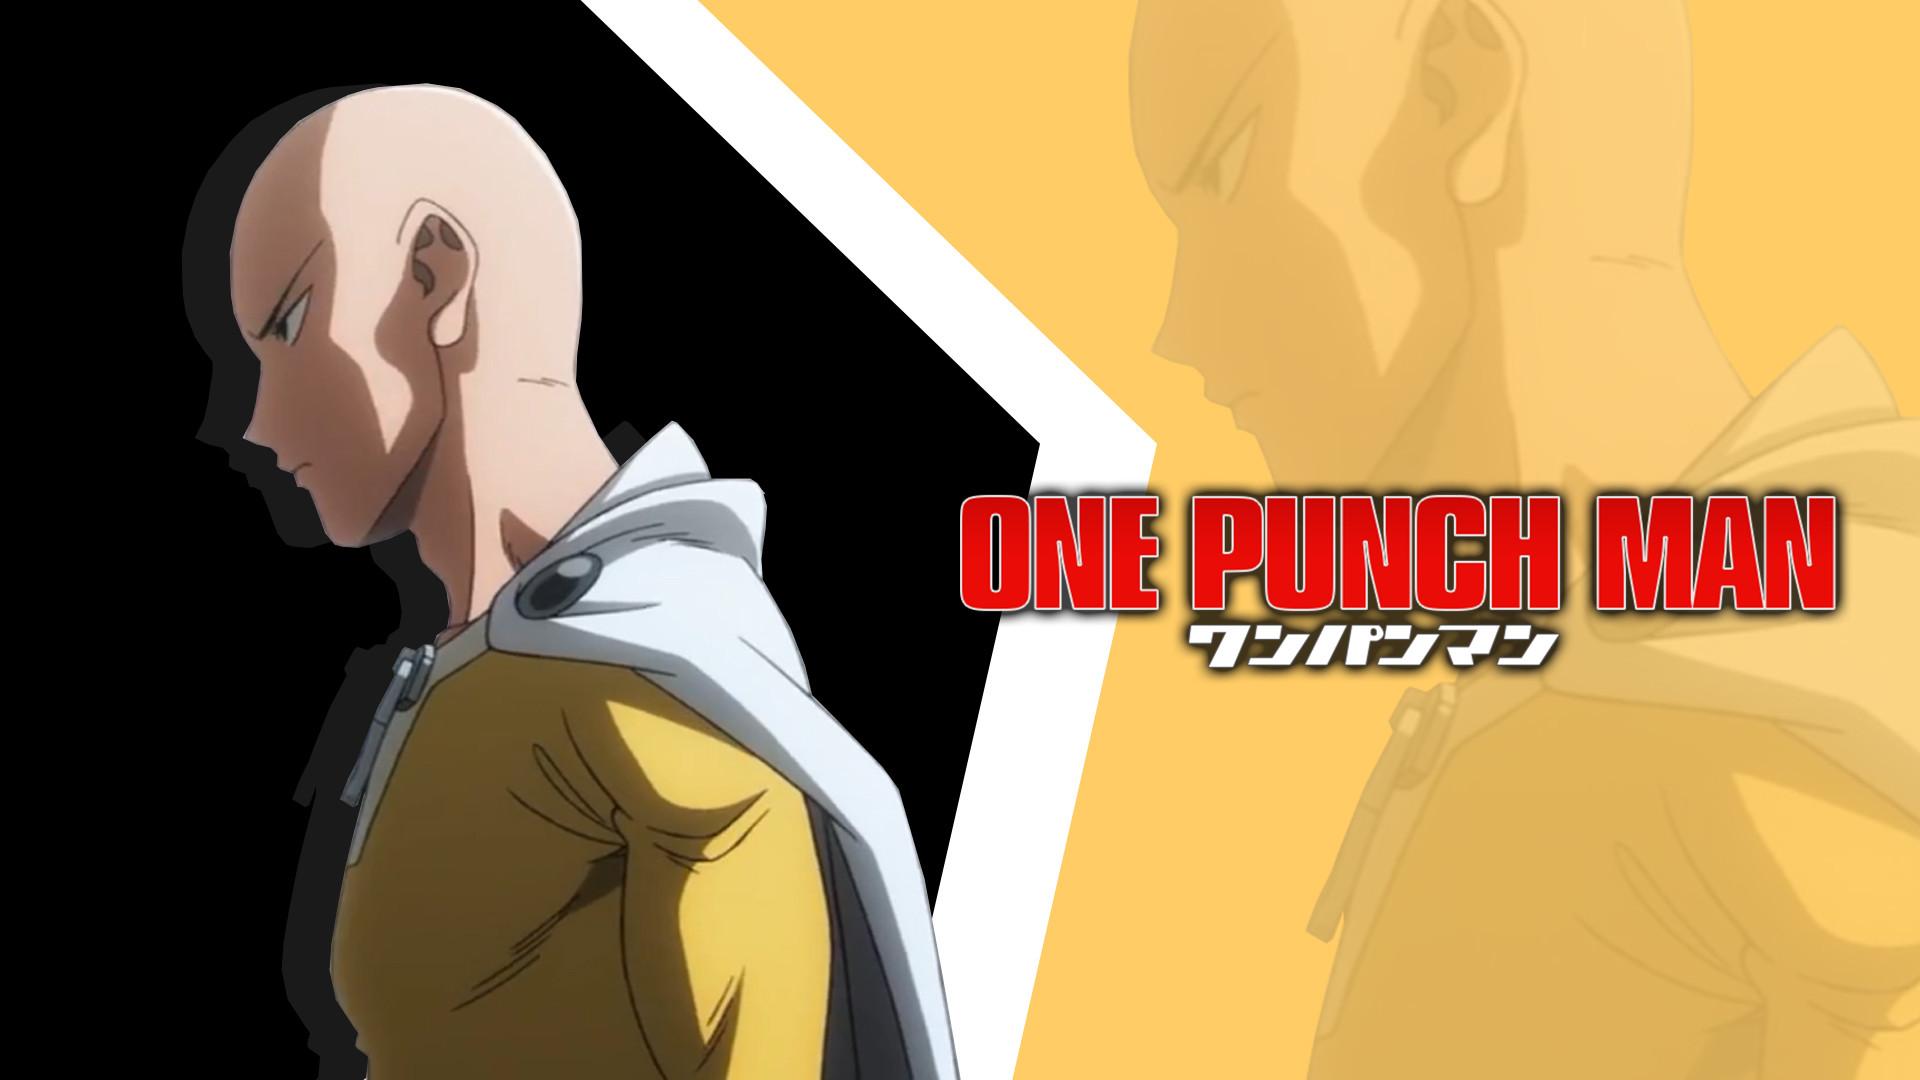 Serious Saitama Anime One Punch Man Wallpaper HD #3032